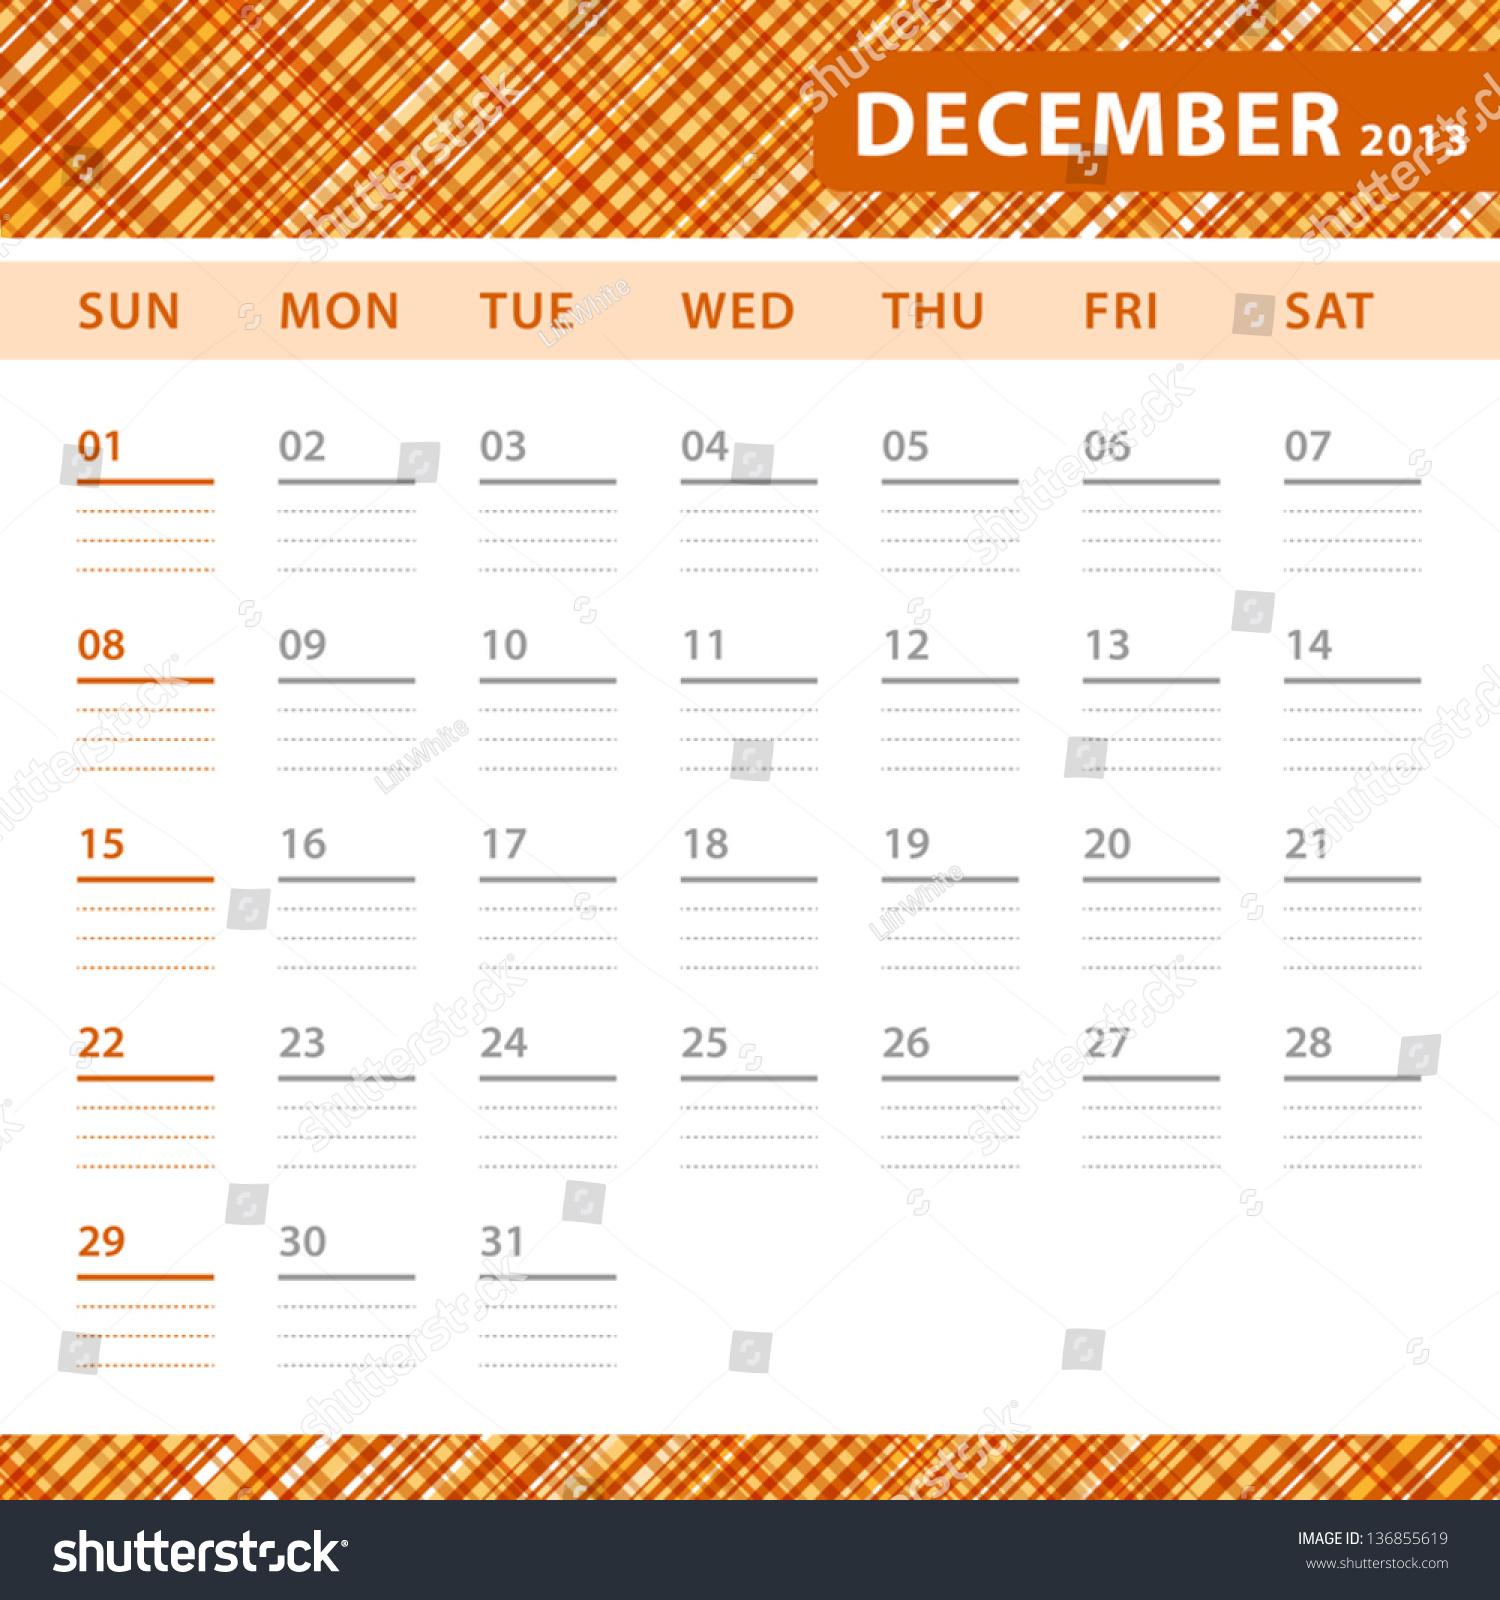 December 2013 Calendar Background december 2013 stock photos, images ...